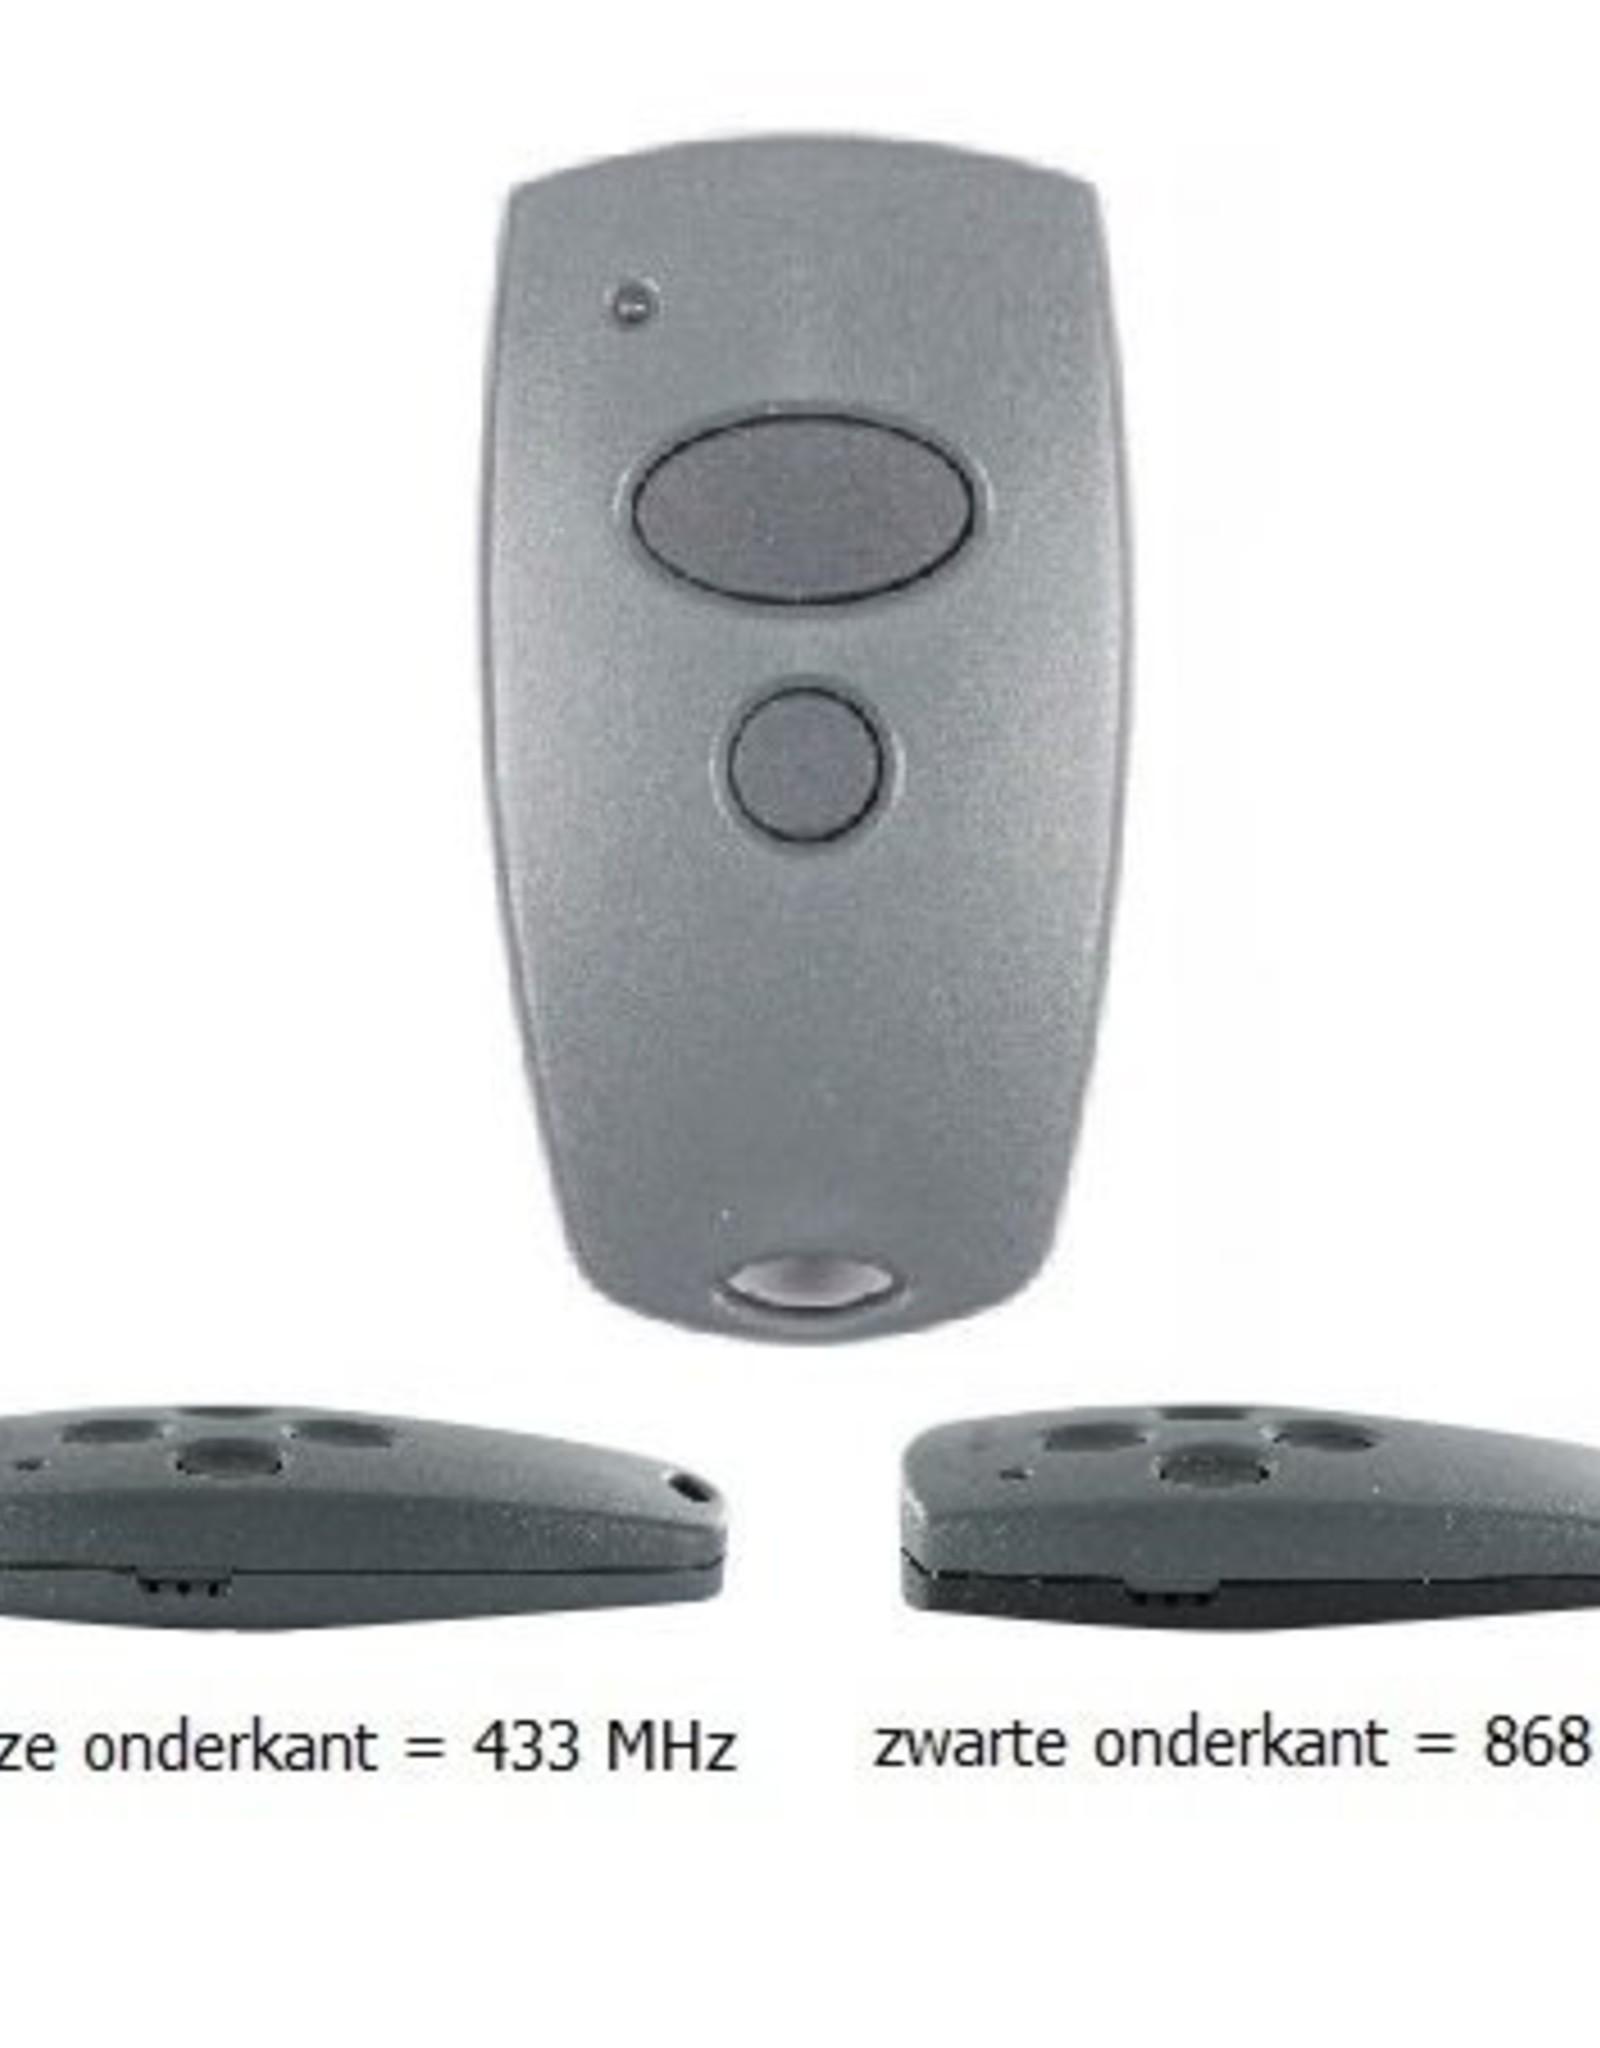 Marantec Marantec Digital 302 Multi-bit 433 MHz 2 kanaals handzender